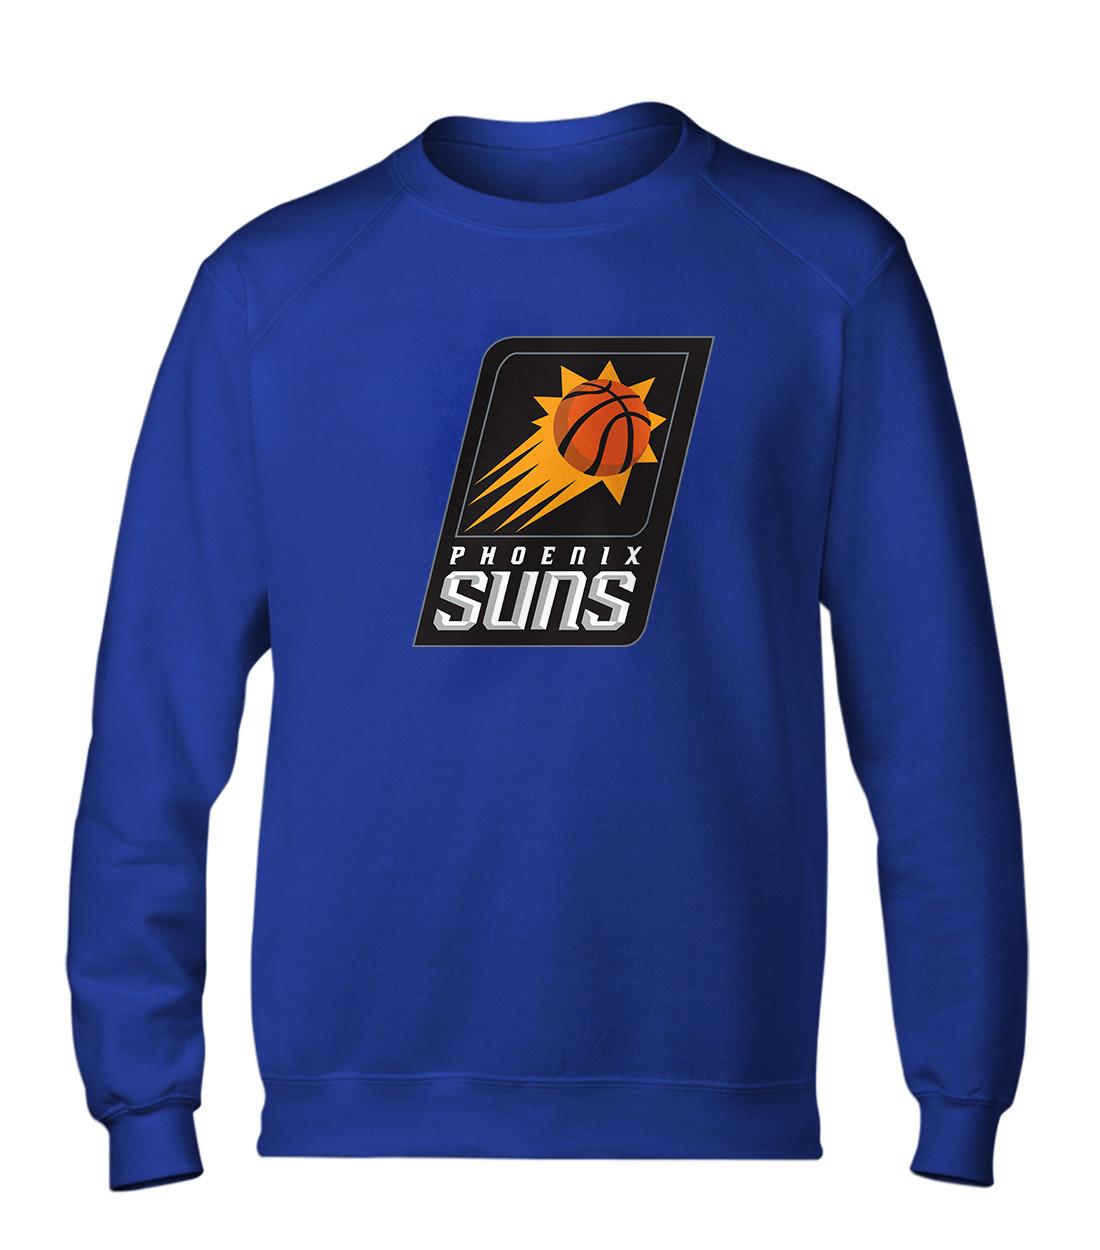 Phoenix Suns Basic (BSC-BLU-NP-187-NBA-PHO-LOGO)